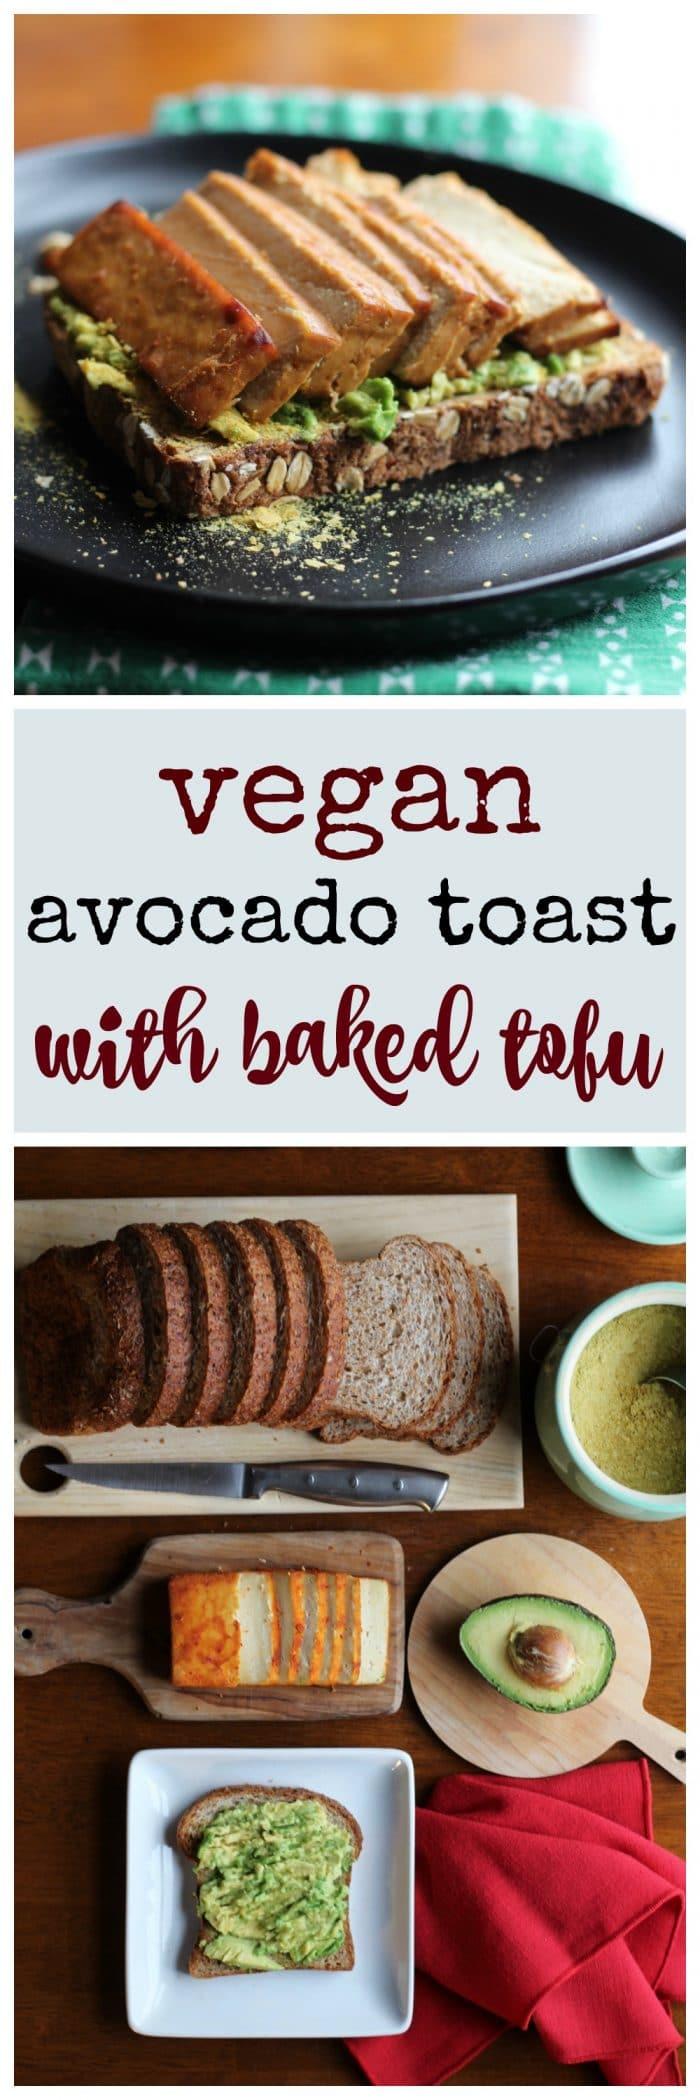 Vegan avocado toast with baked tofu + text.